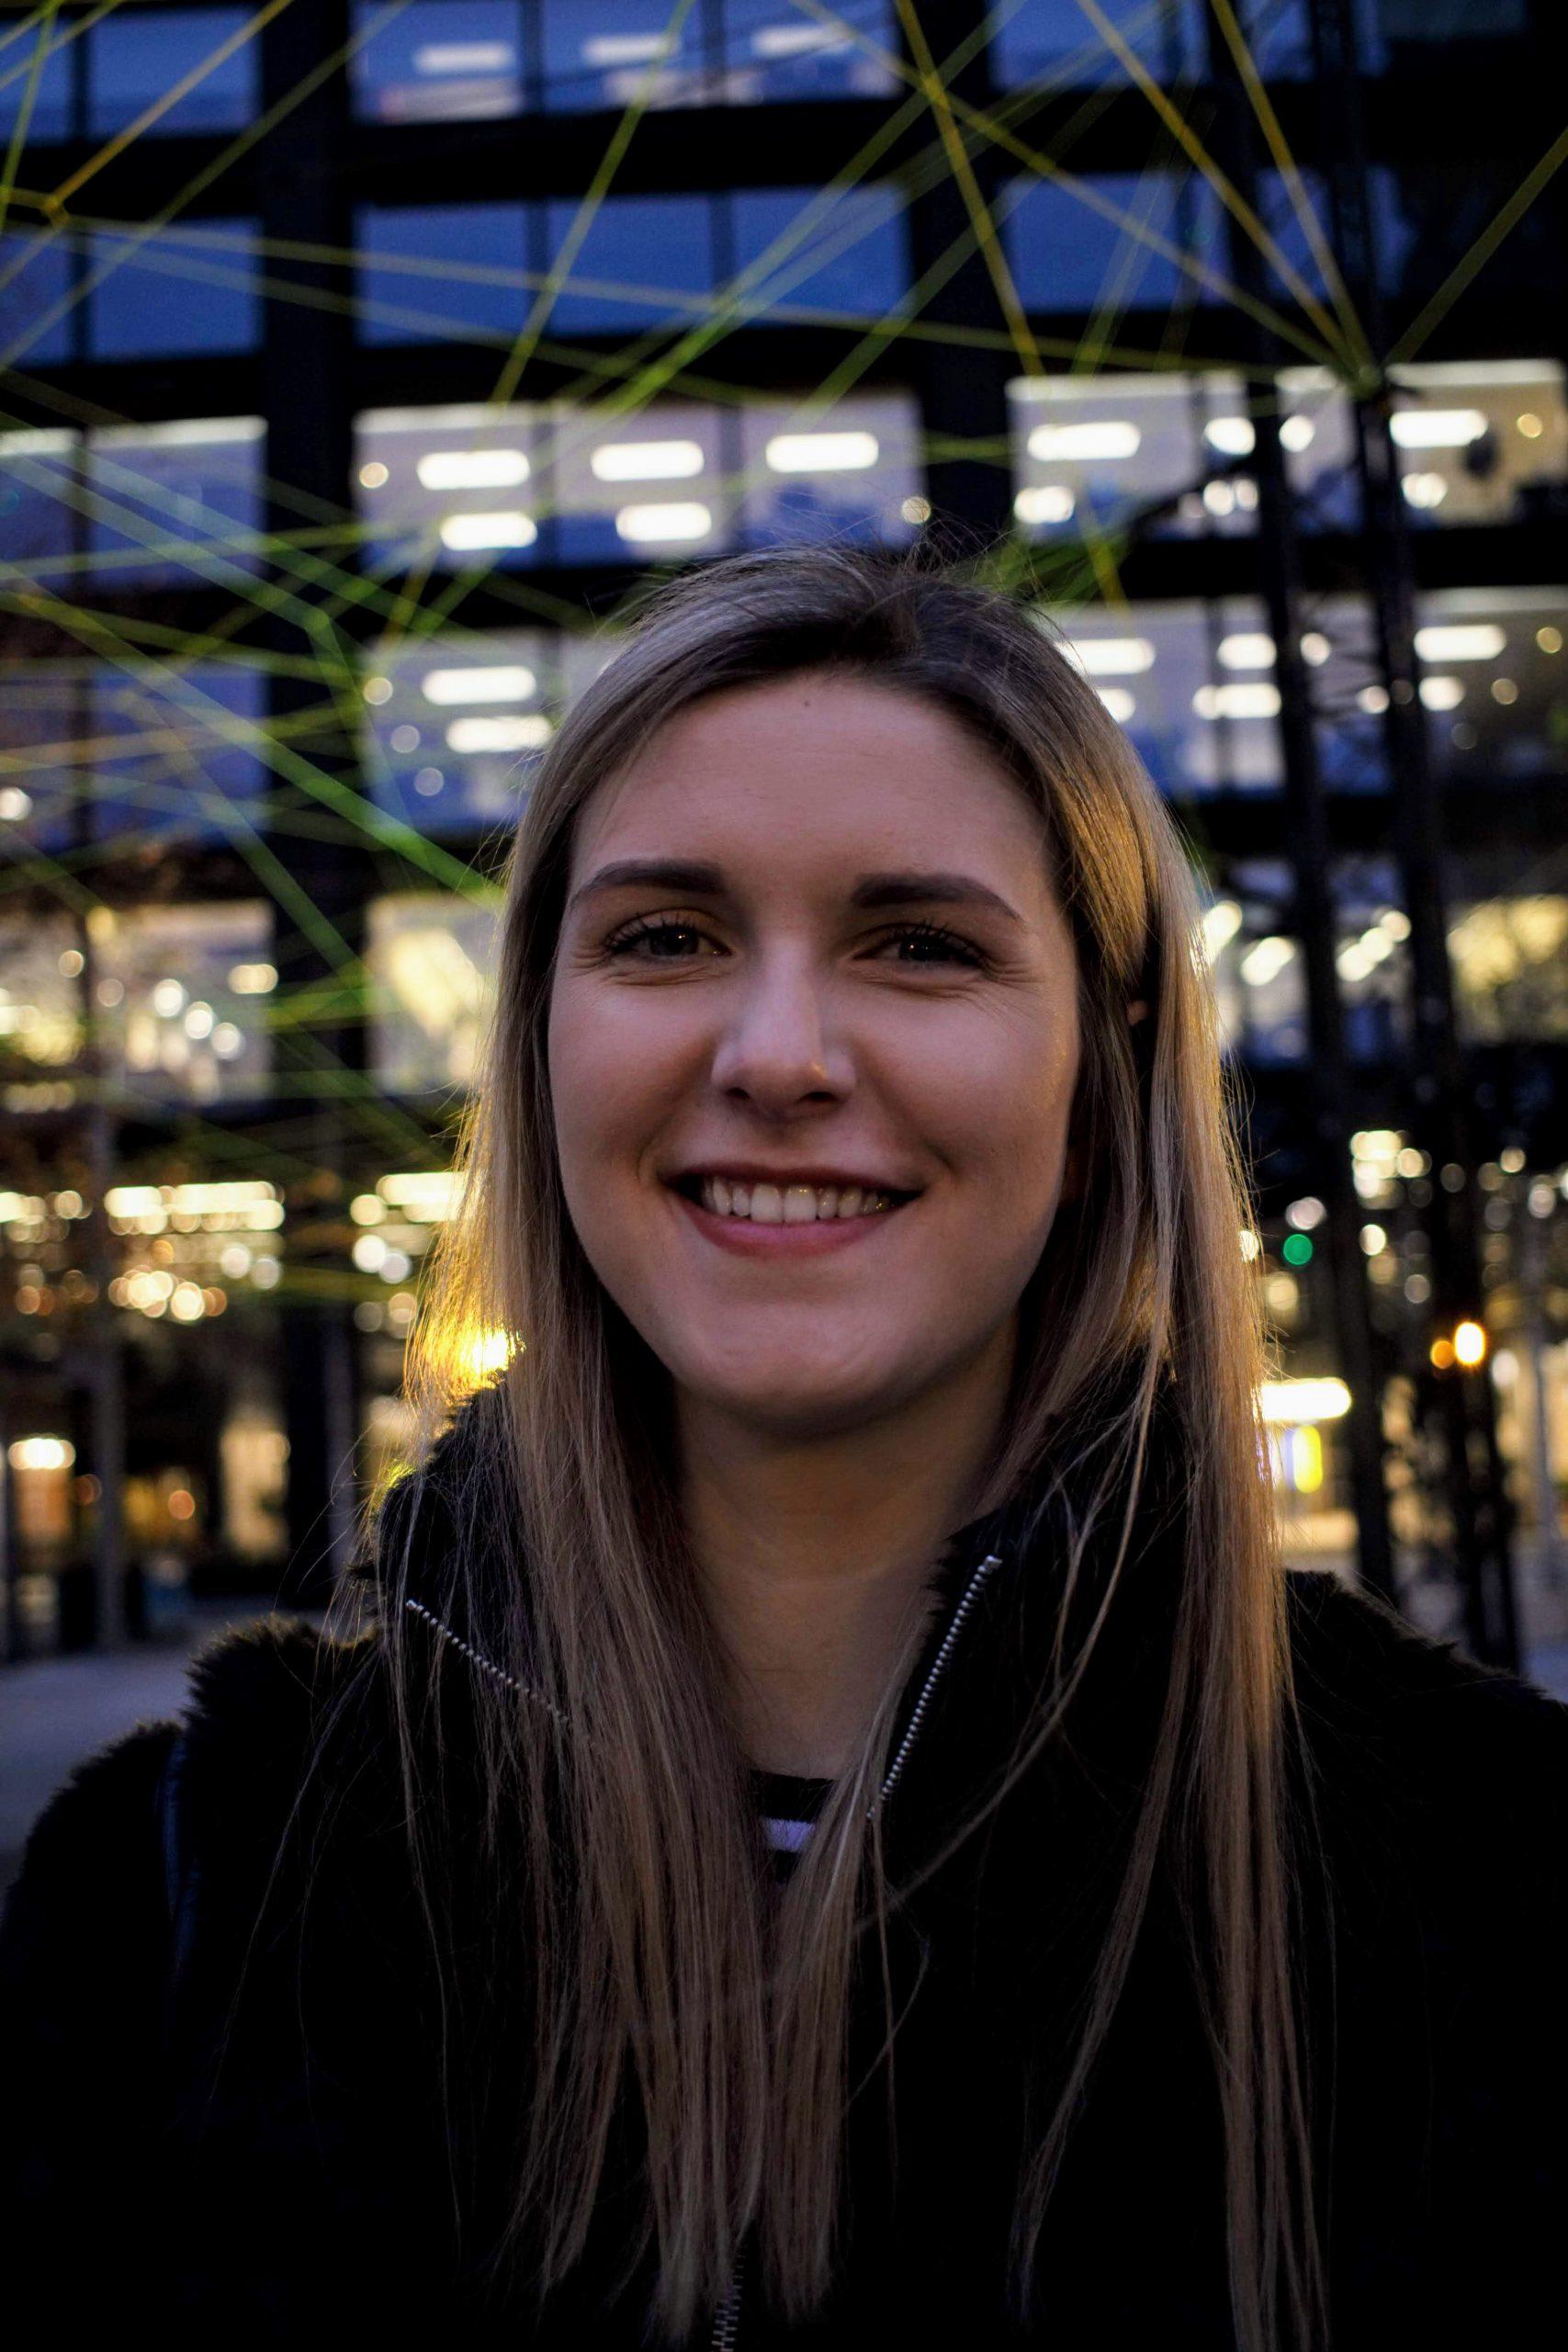 Jess Horne